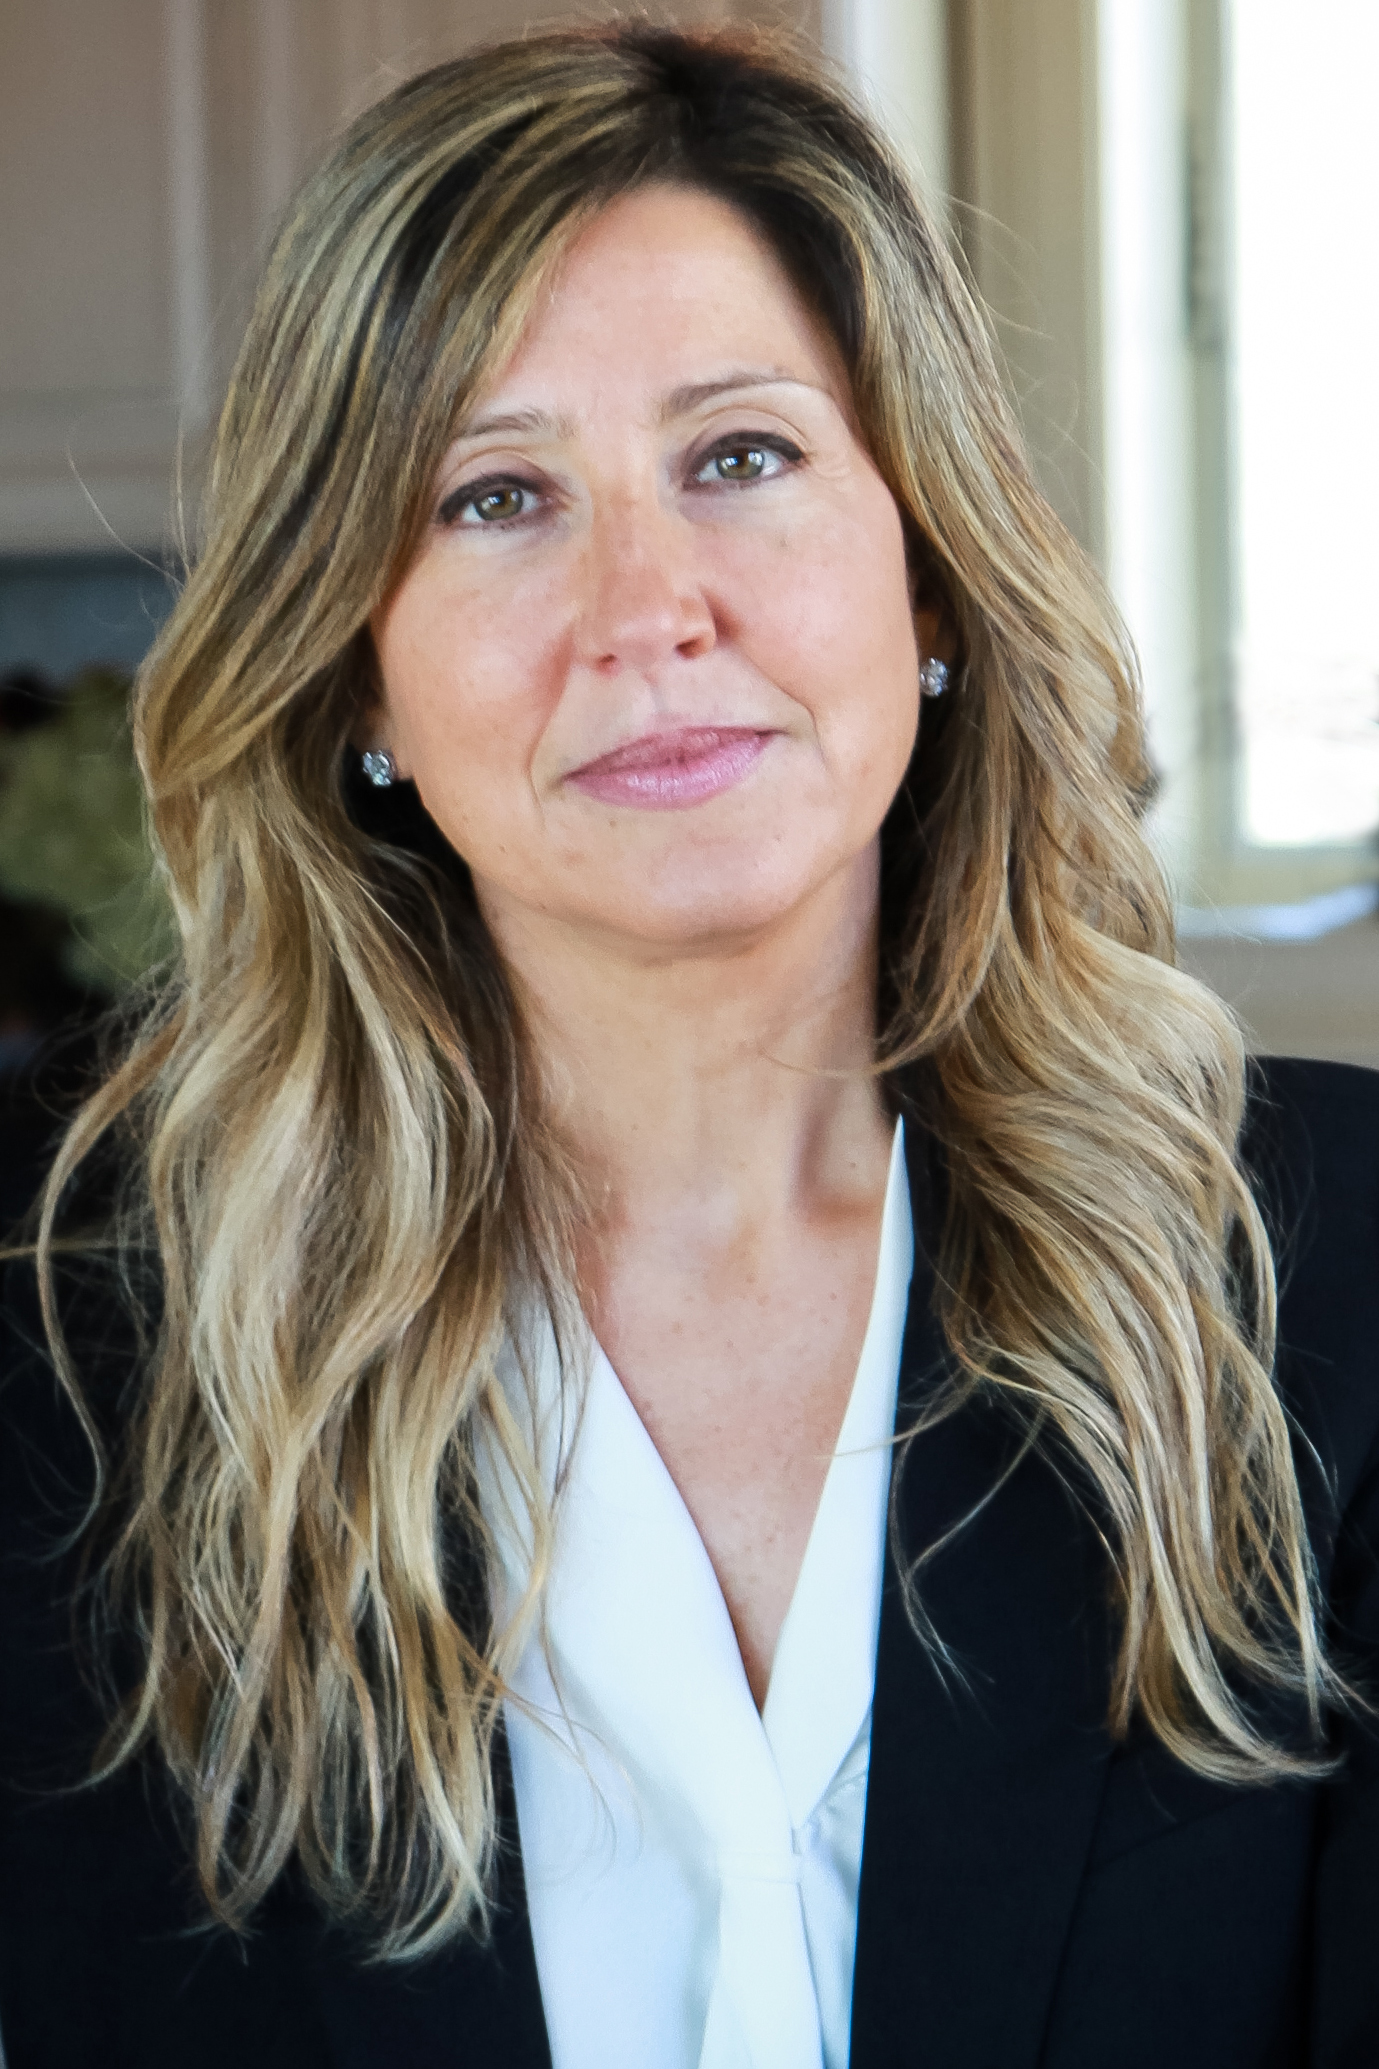 Christa Genovese